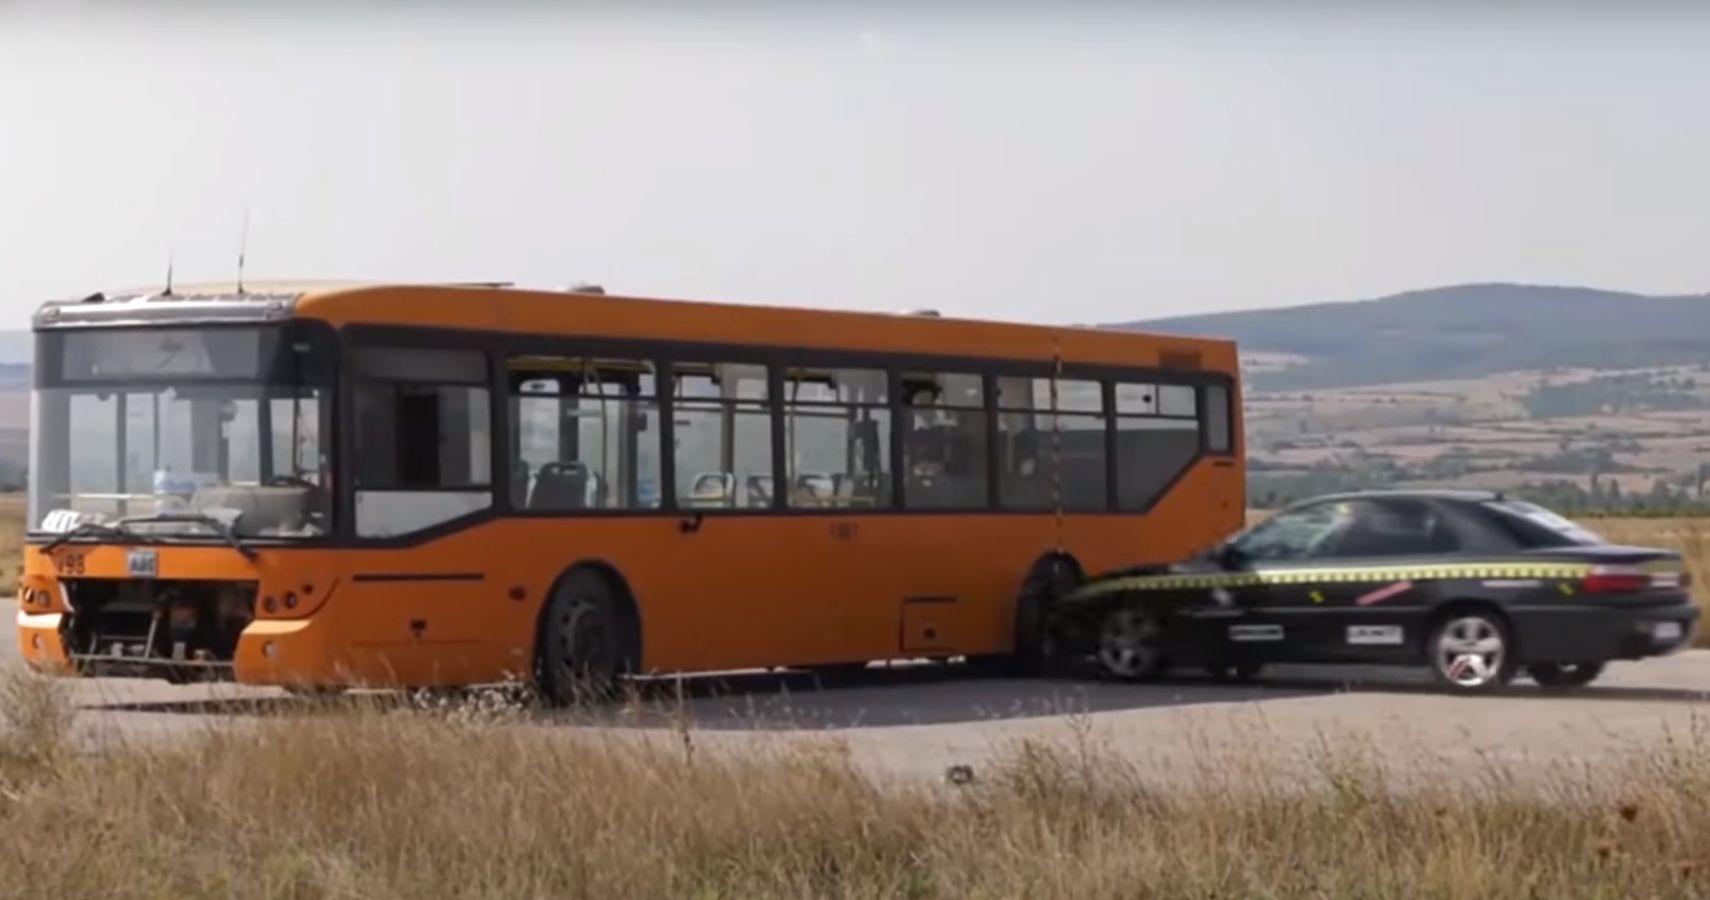 Watch The Impact A Driverless Sedan Makes Smashing Into A Bus At 129 MPH